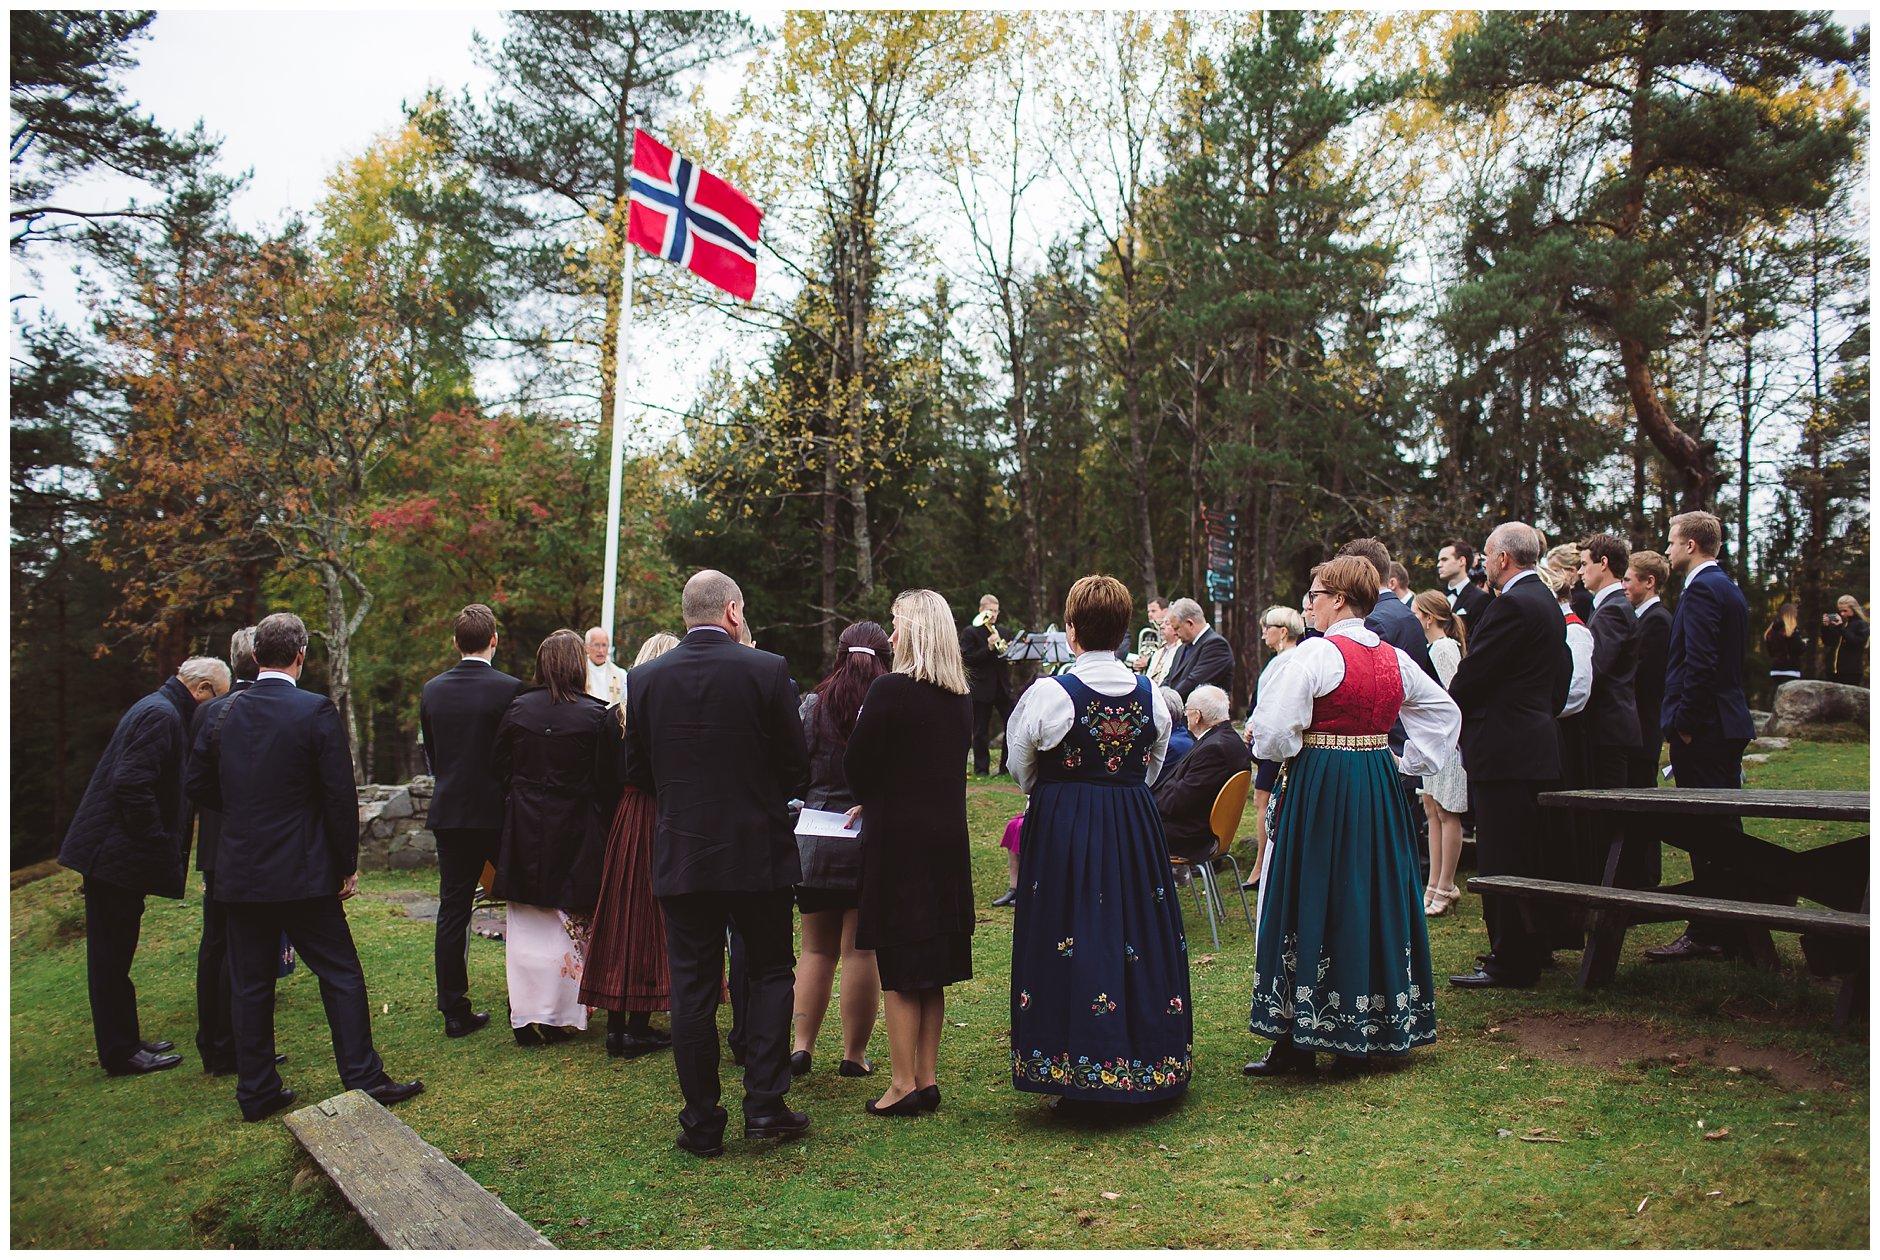 Høstbryllup Utendørs vielse Østmarka Oslo SIggerud Langhus Vangen Skistue